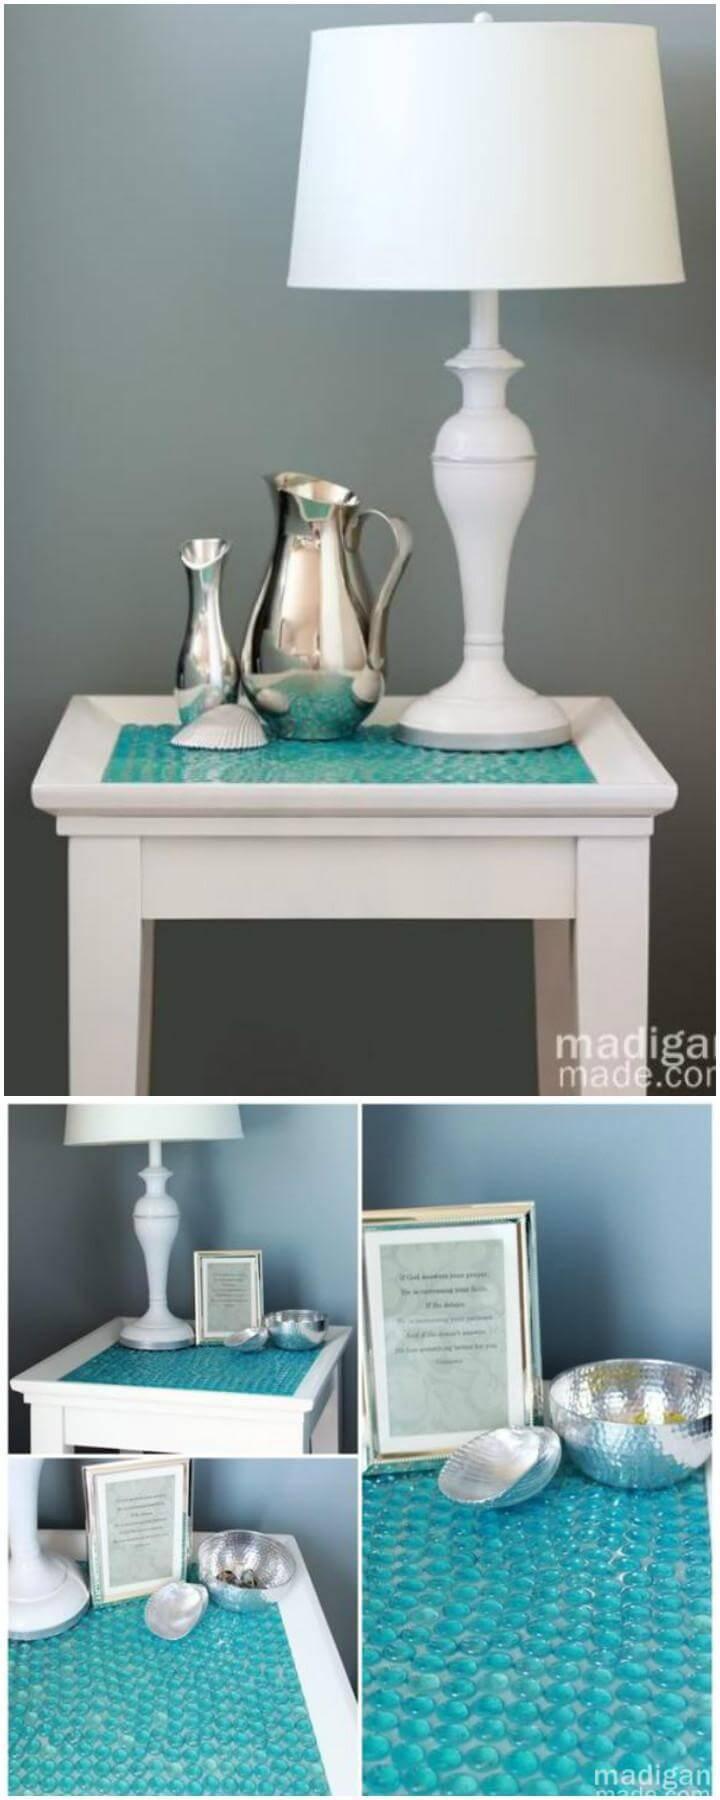 DIY Glass Gems Tiled Table